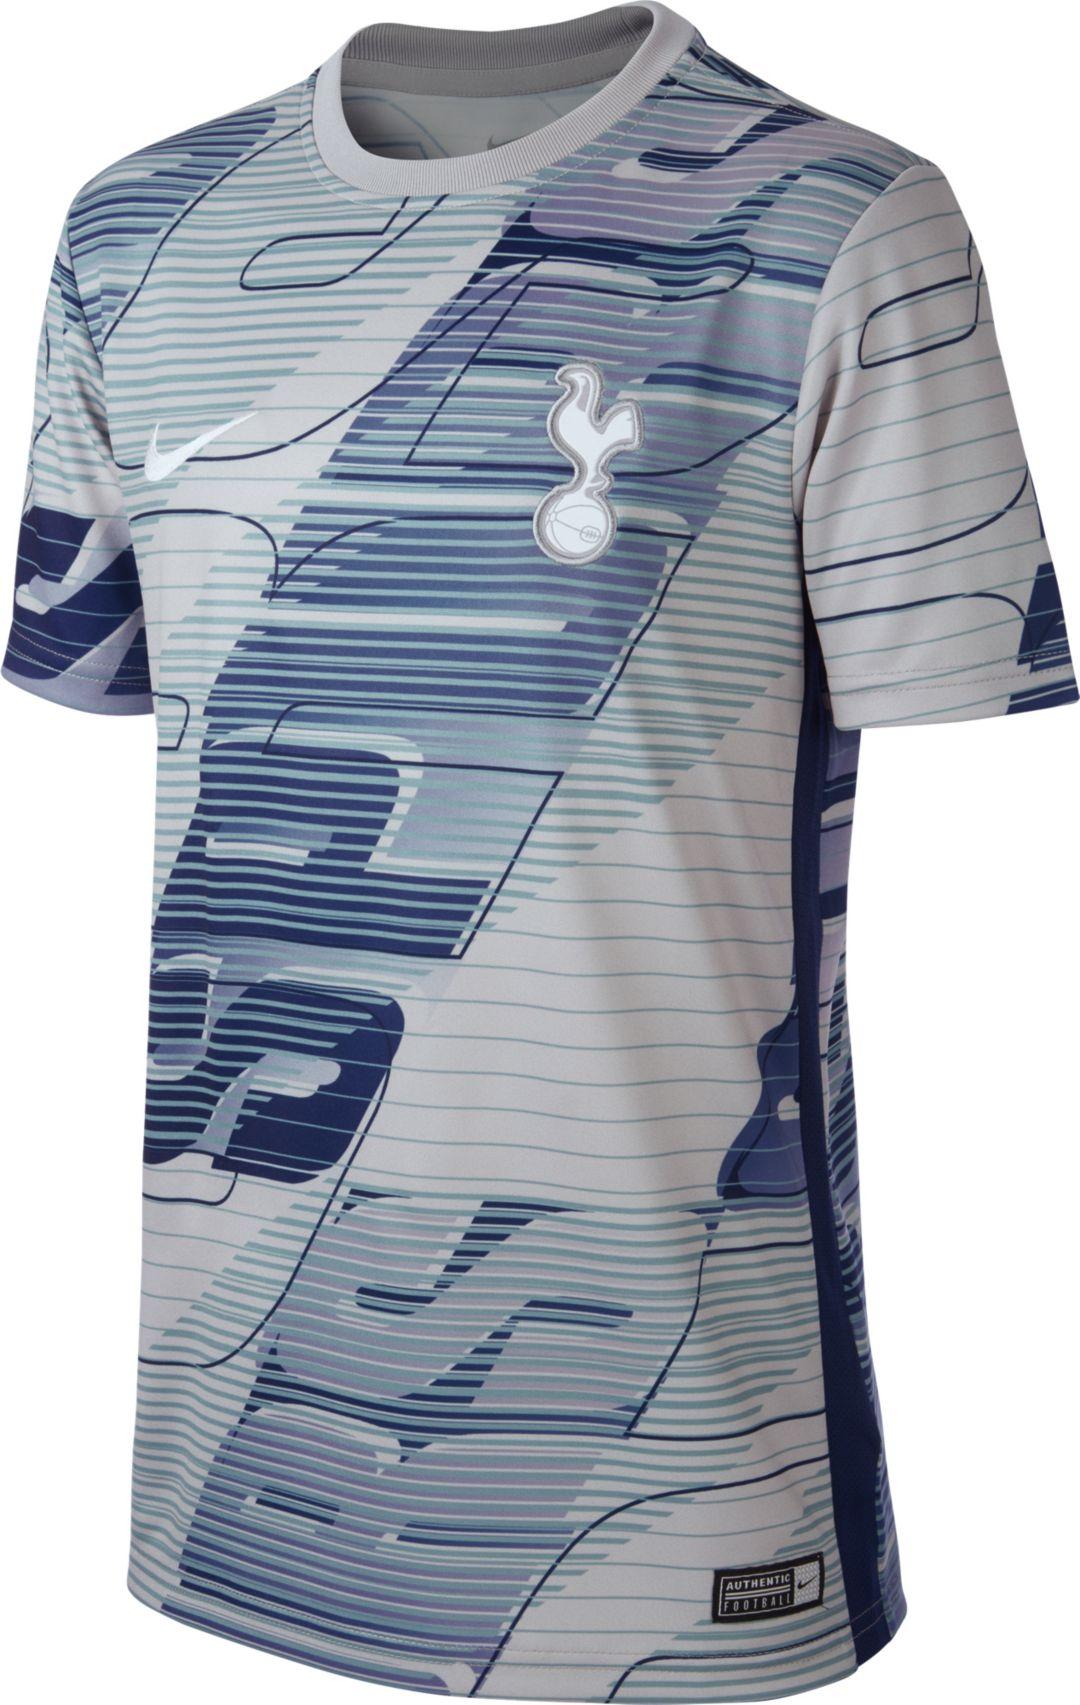 half off 37303 1770f Nike Youth Tottenham Hotspur '19 Home Prematch Performance Shirt